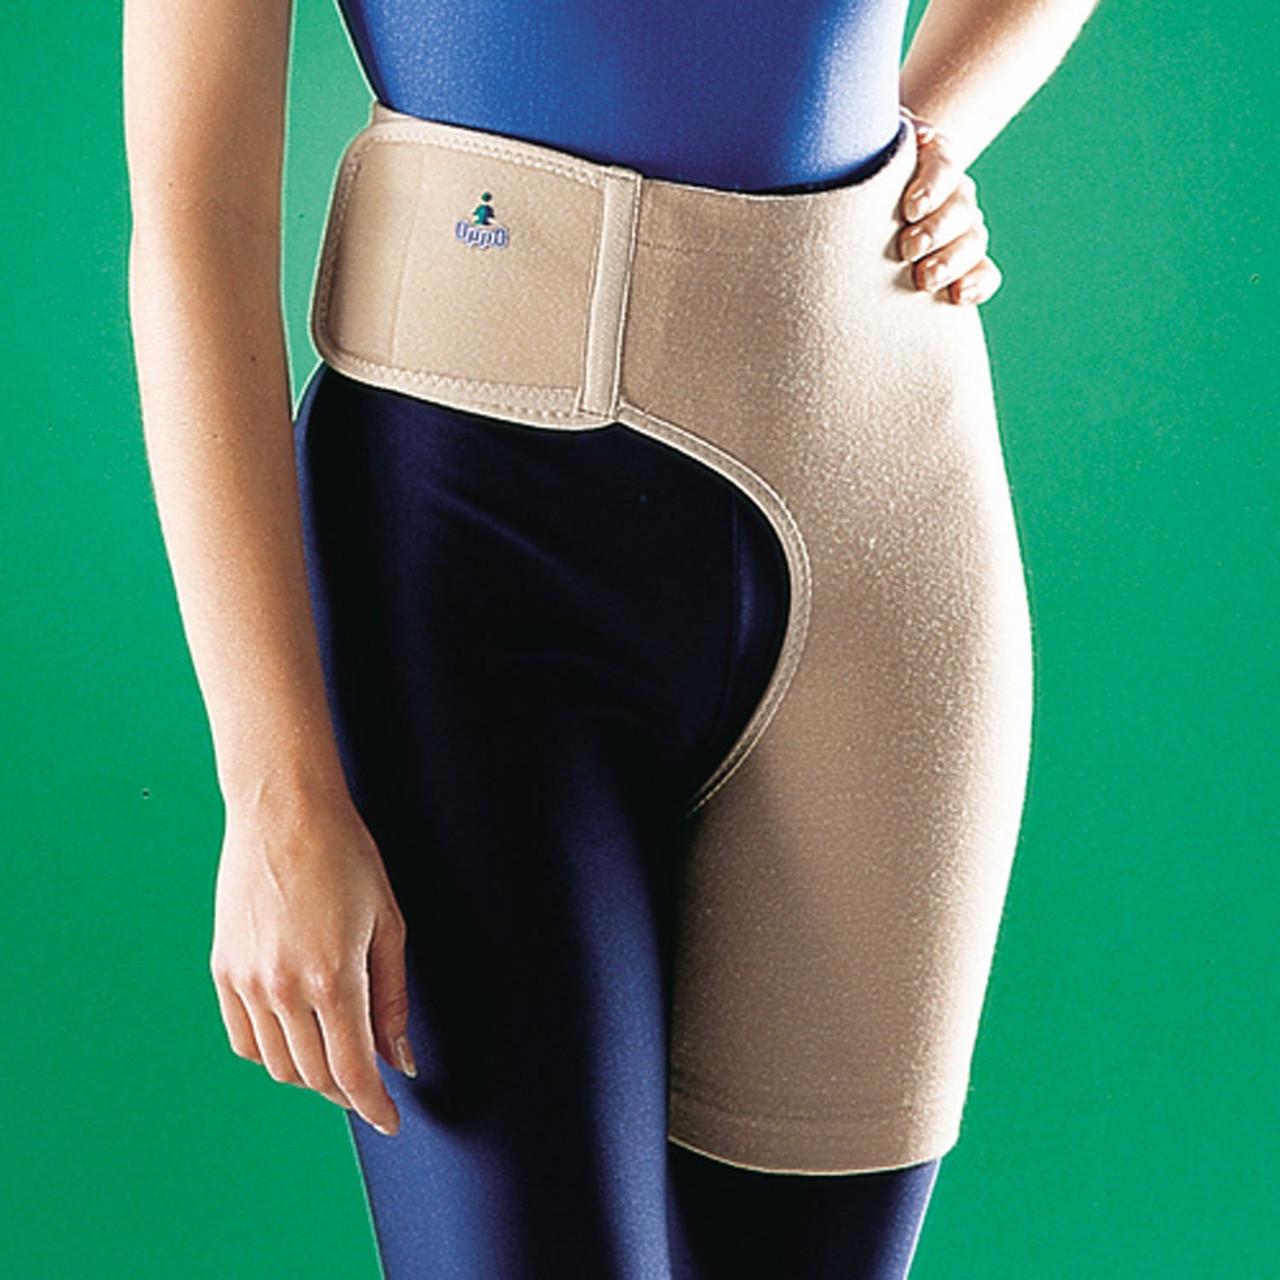 Ортез на тазобедренный сустав 2041 болит колено при выпрямлении